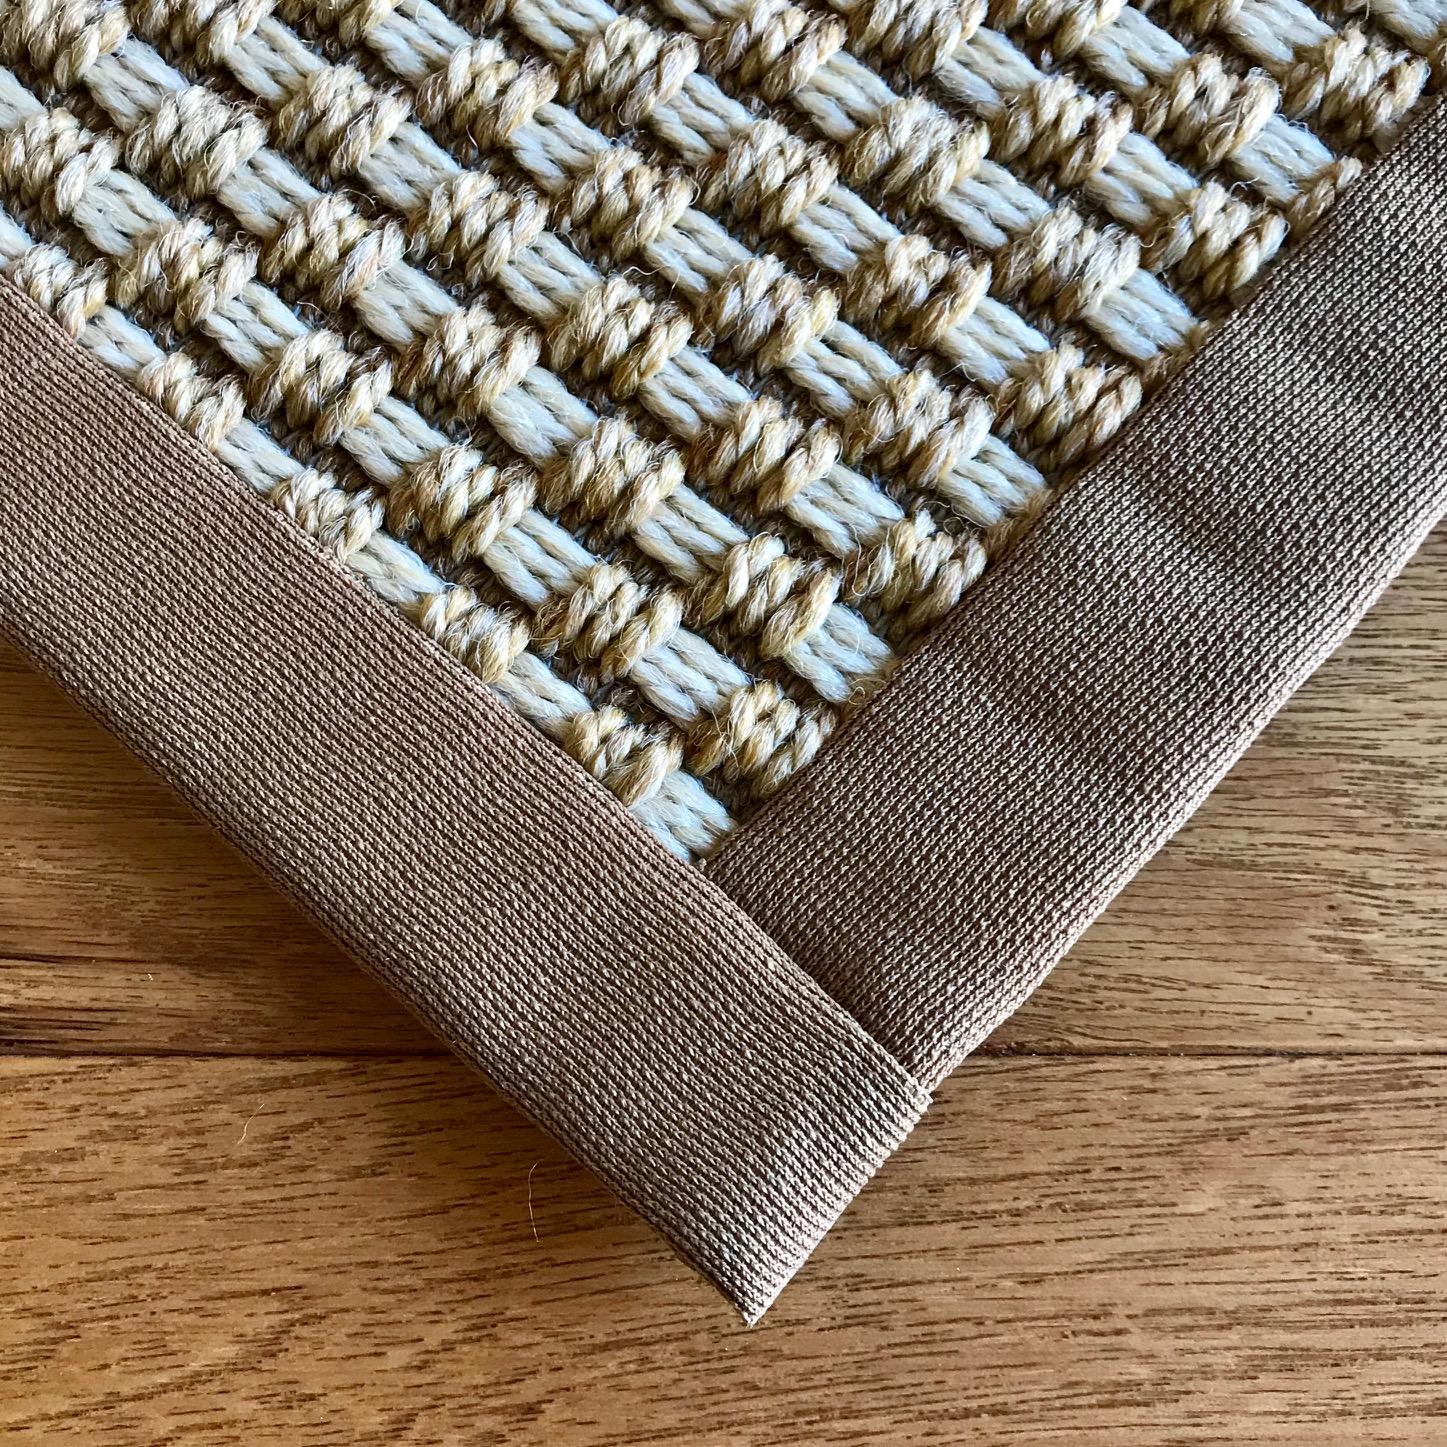 fabric bind - blind stitch.jpg